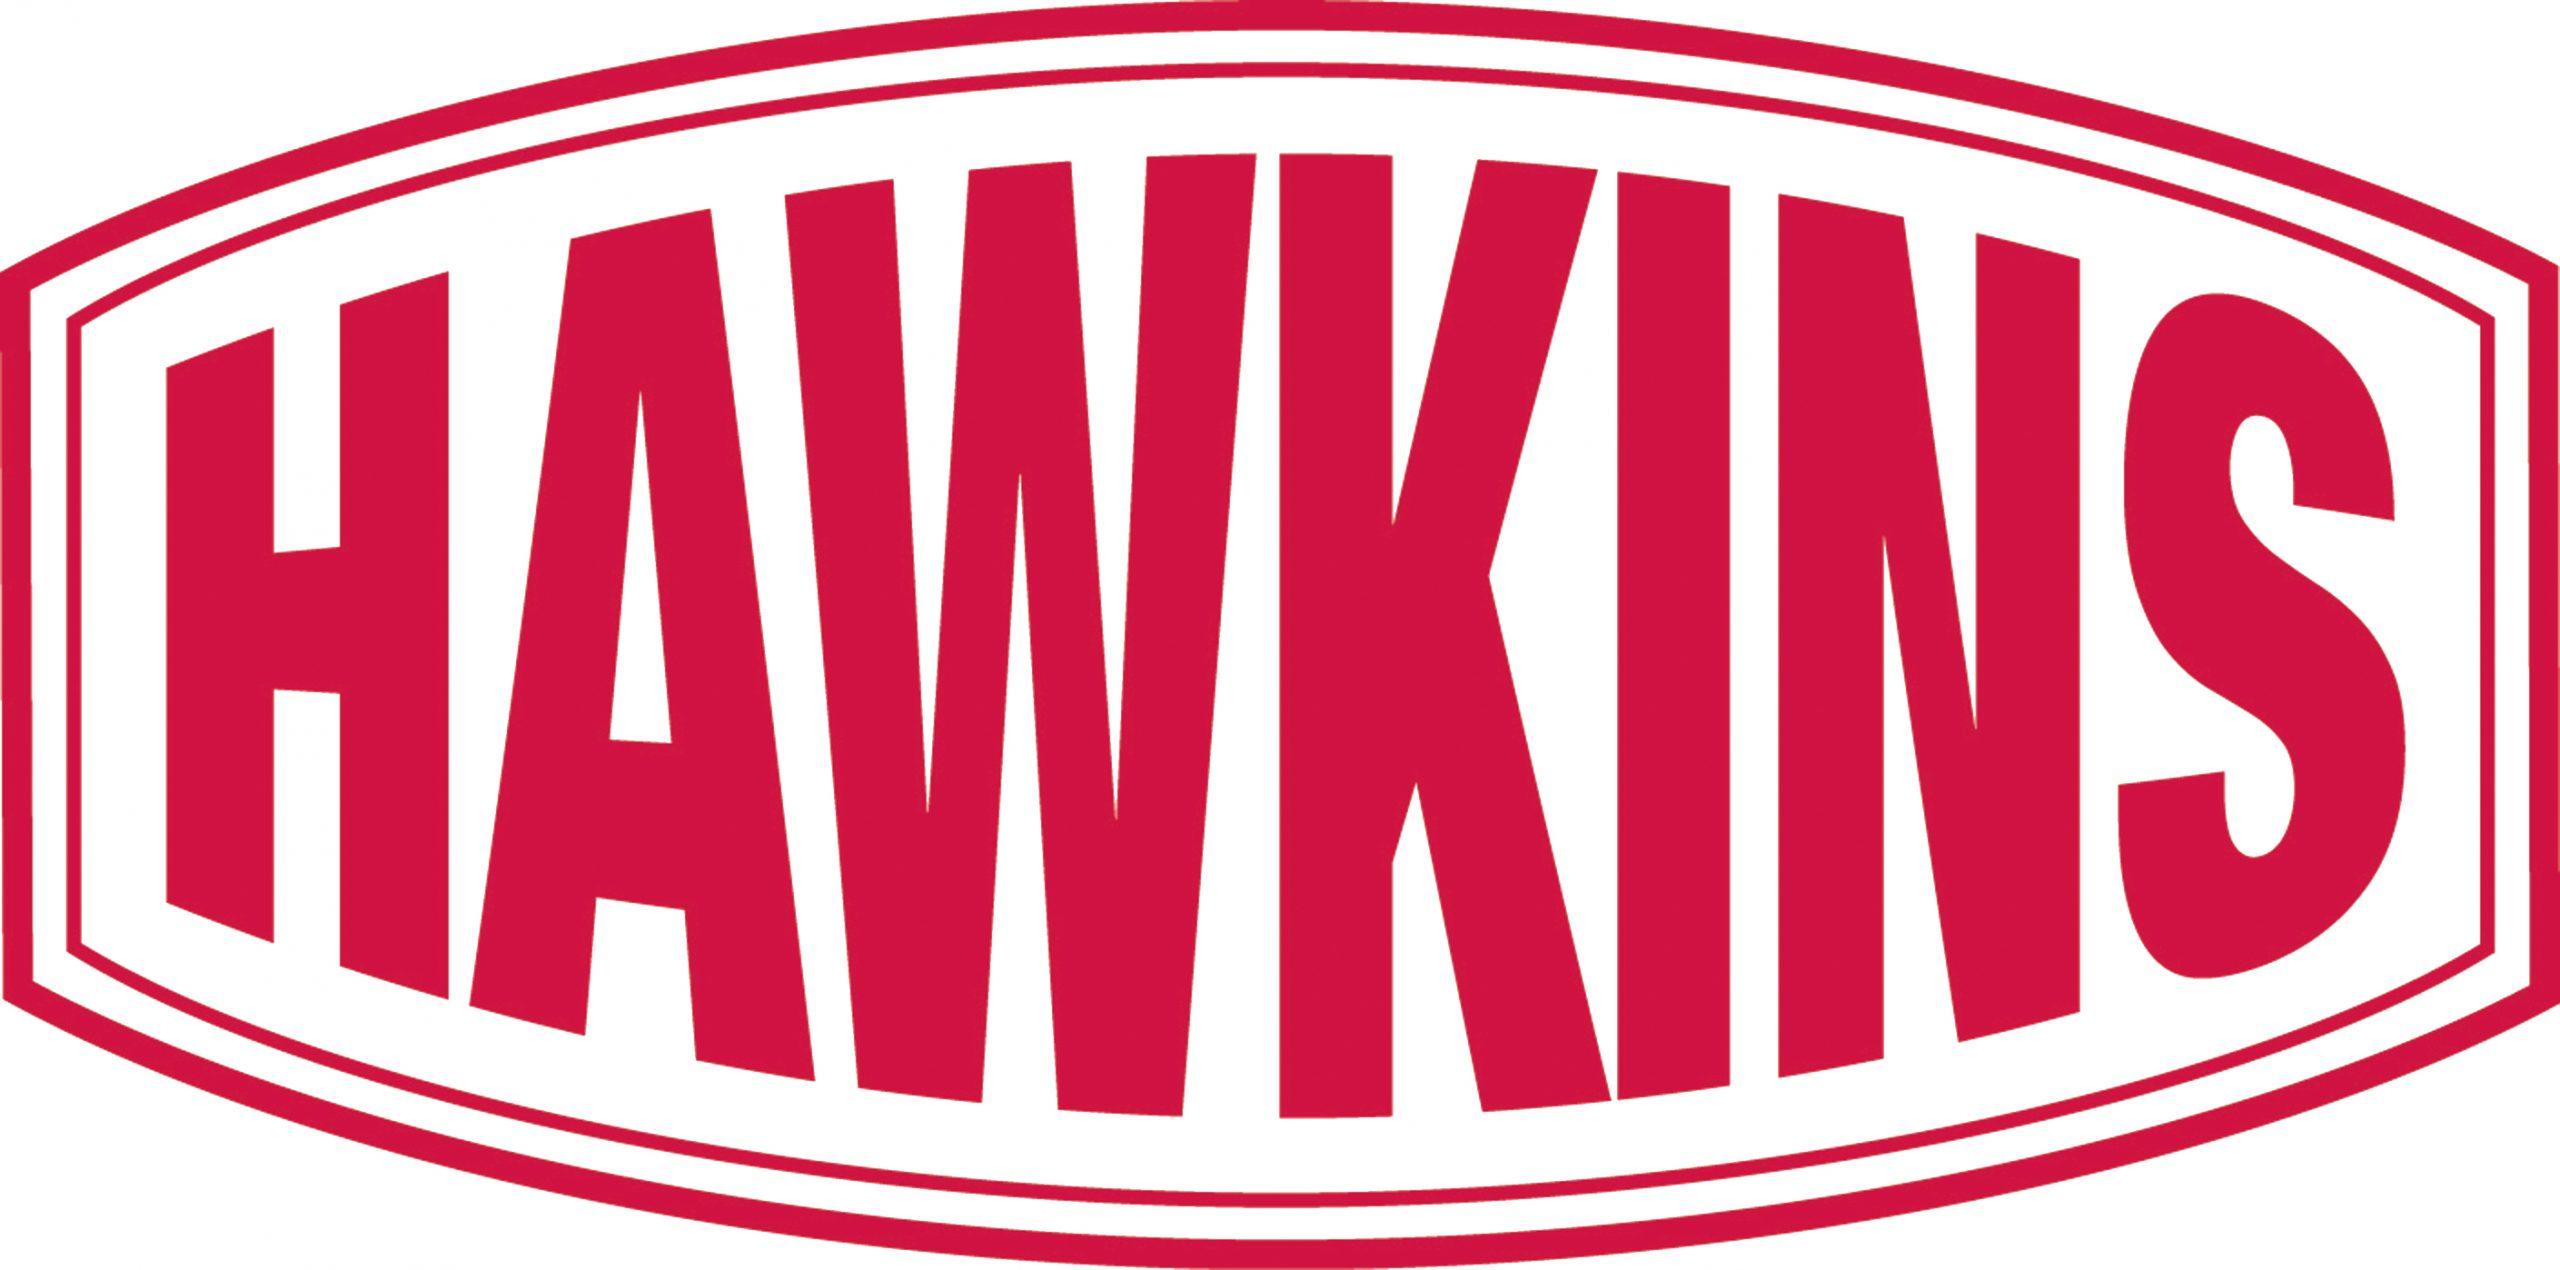 Hawkins-300-no-corners-all-transparent-jpeg